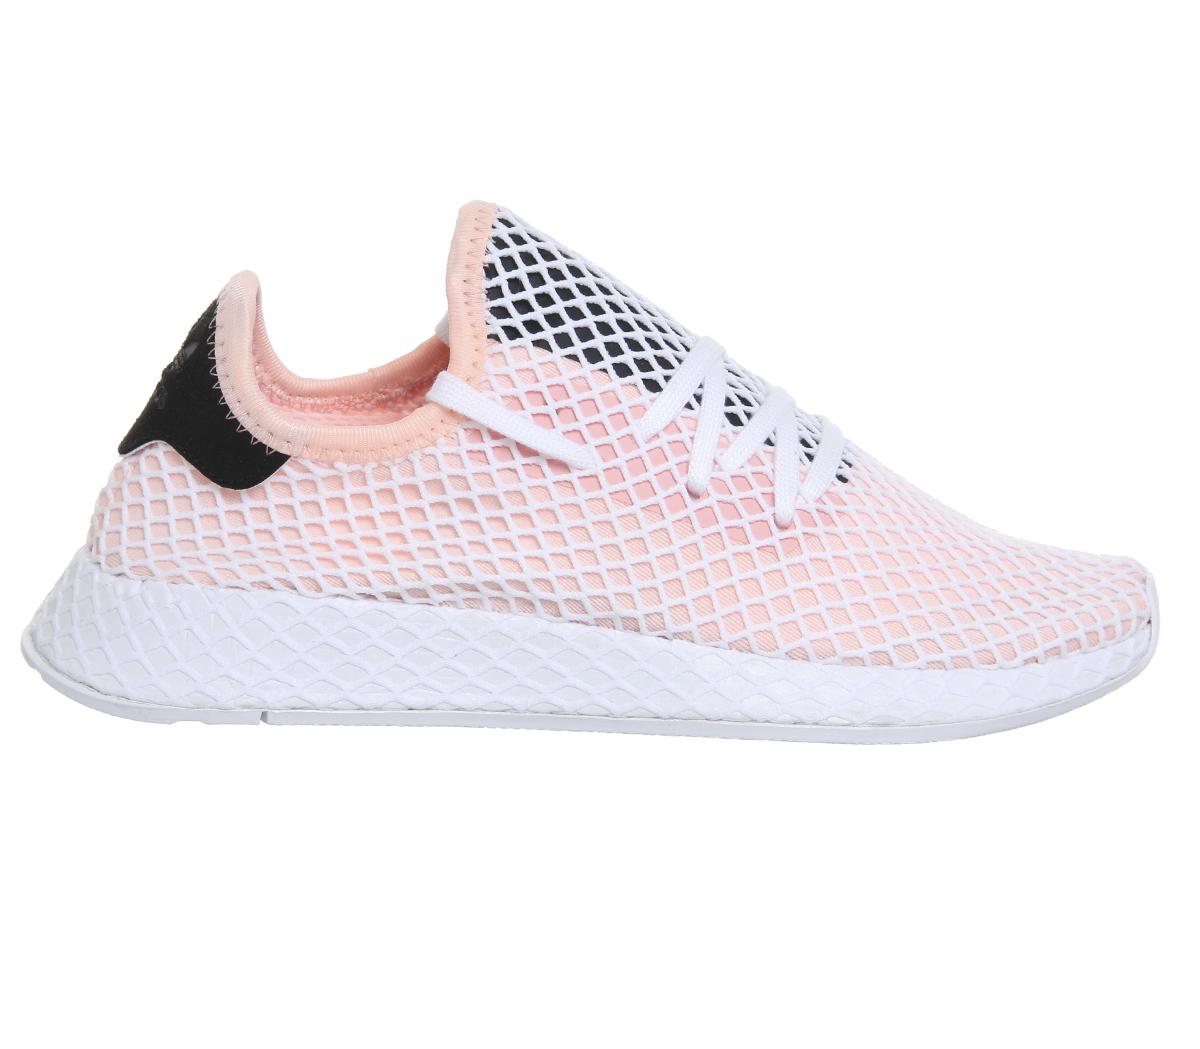 e57be24de Sentinel Mens Adidas Deerupt Trainers Pink White Core Black Trainers Shoes